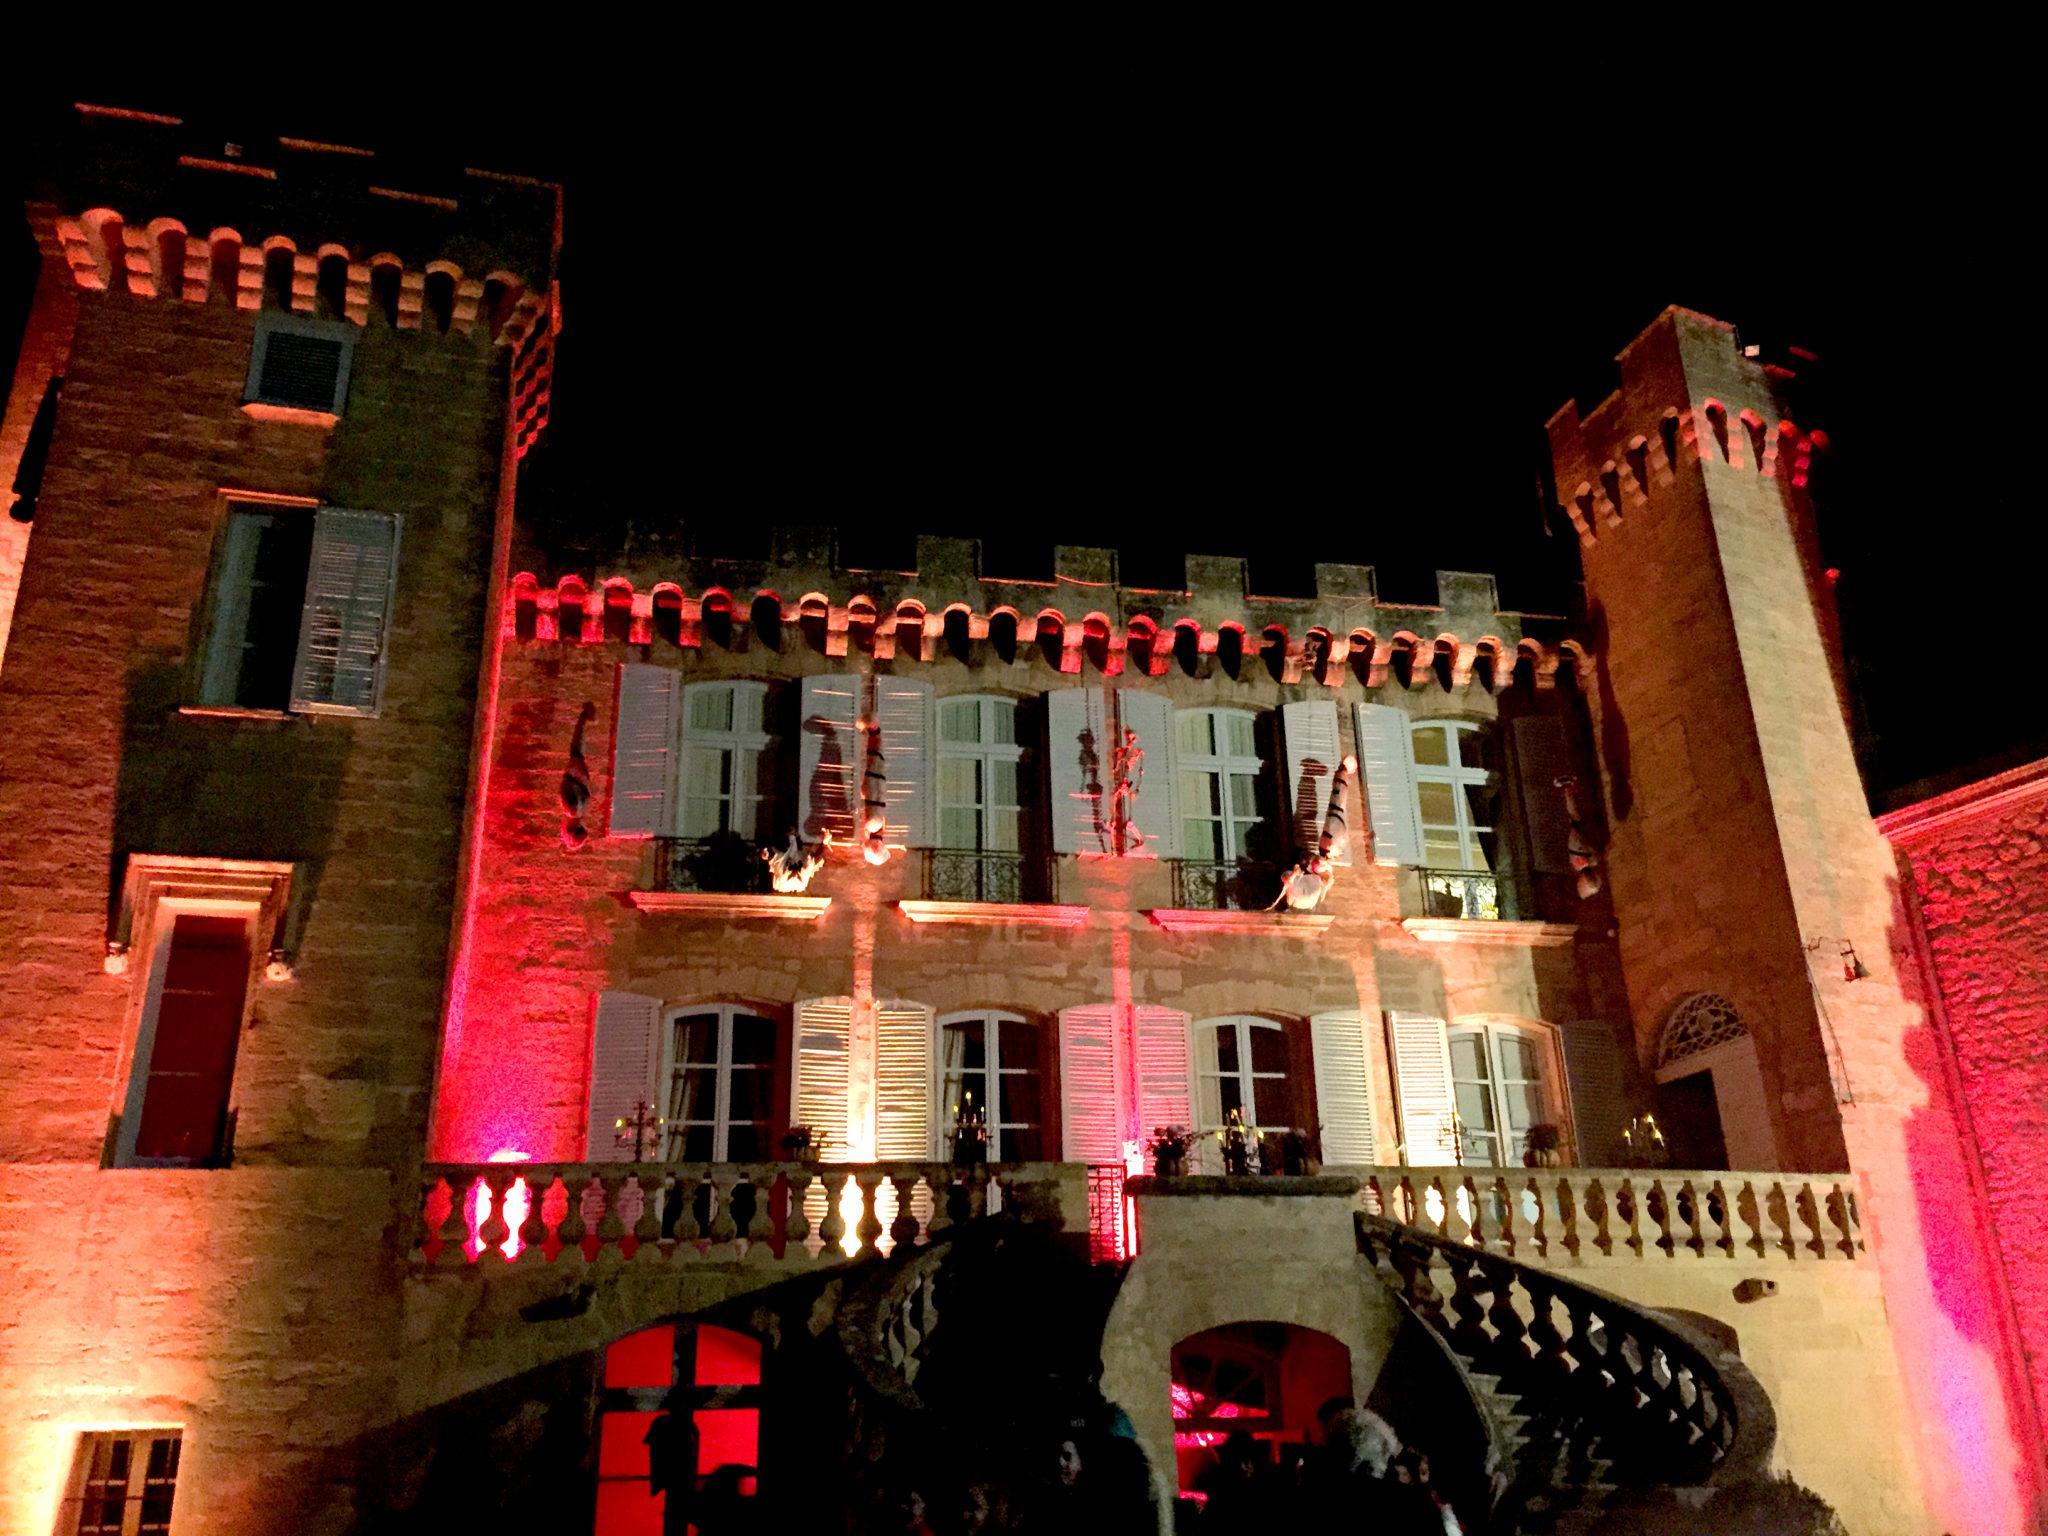 Hema_pose_ses_valises_halloween_chateau_de_la_barben_2